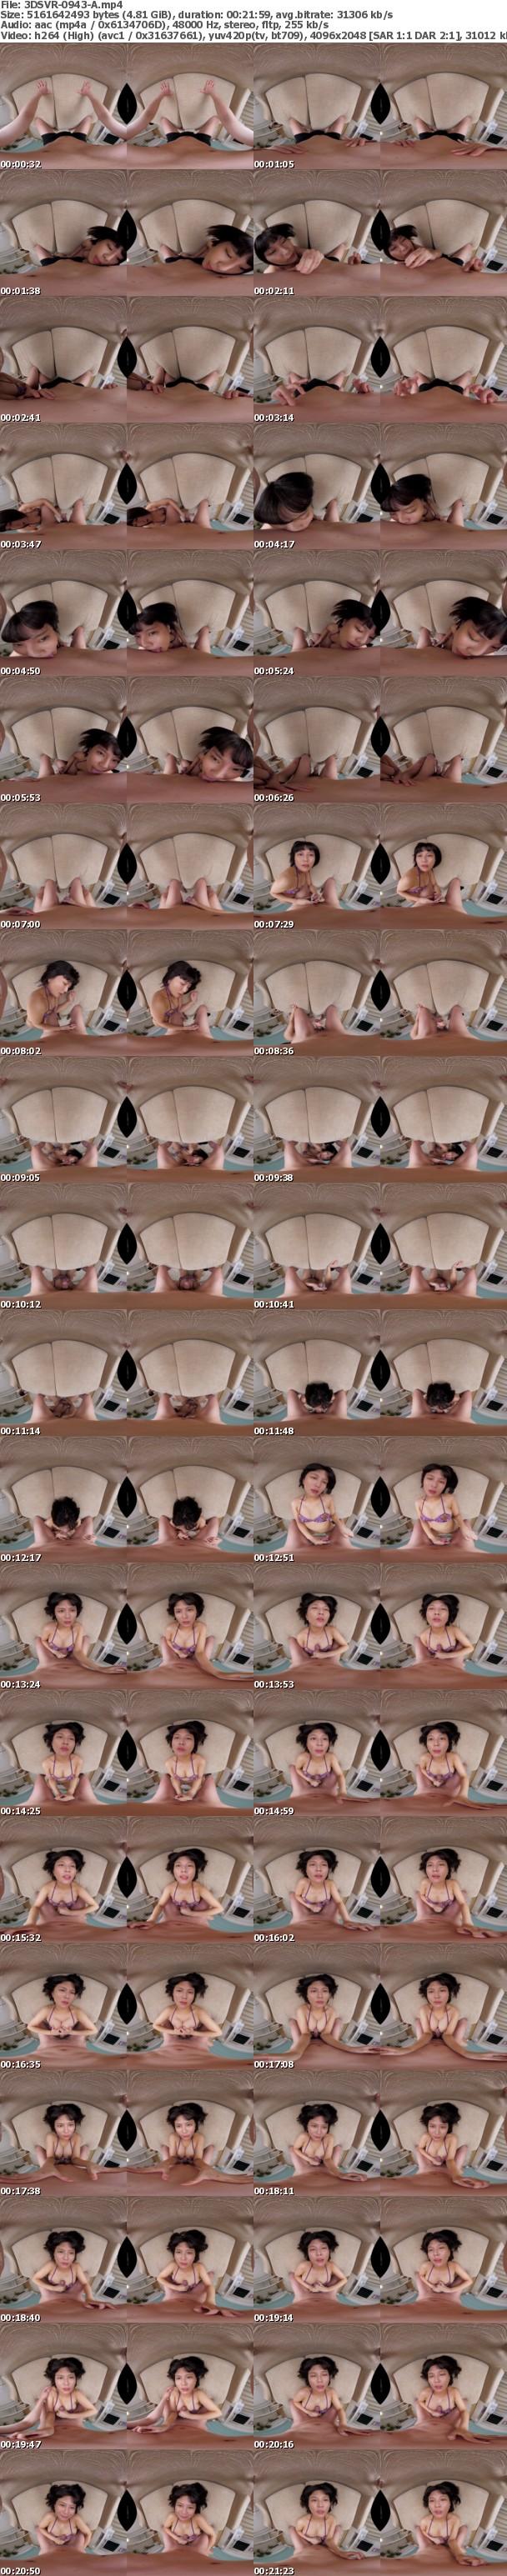 (VR) 3DSVR-0943 新アングル!地面特化VR 【M男専門風俗】四つん這い手コキヘルス